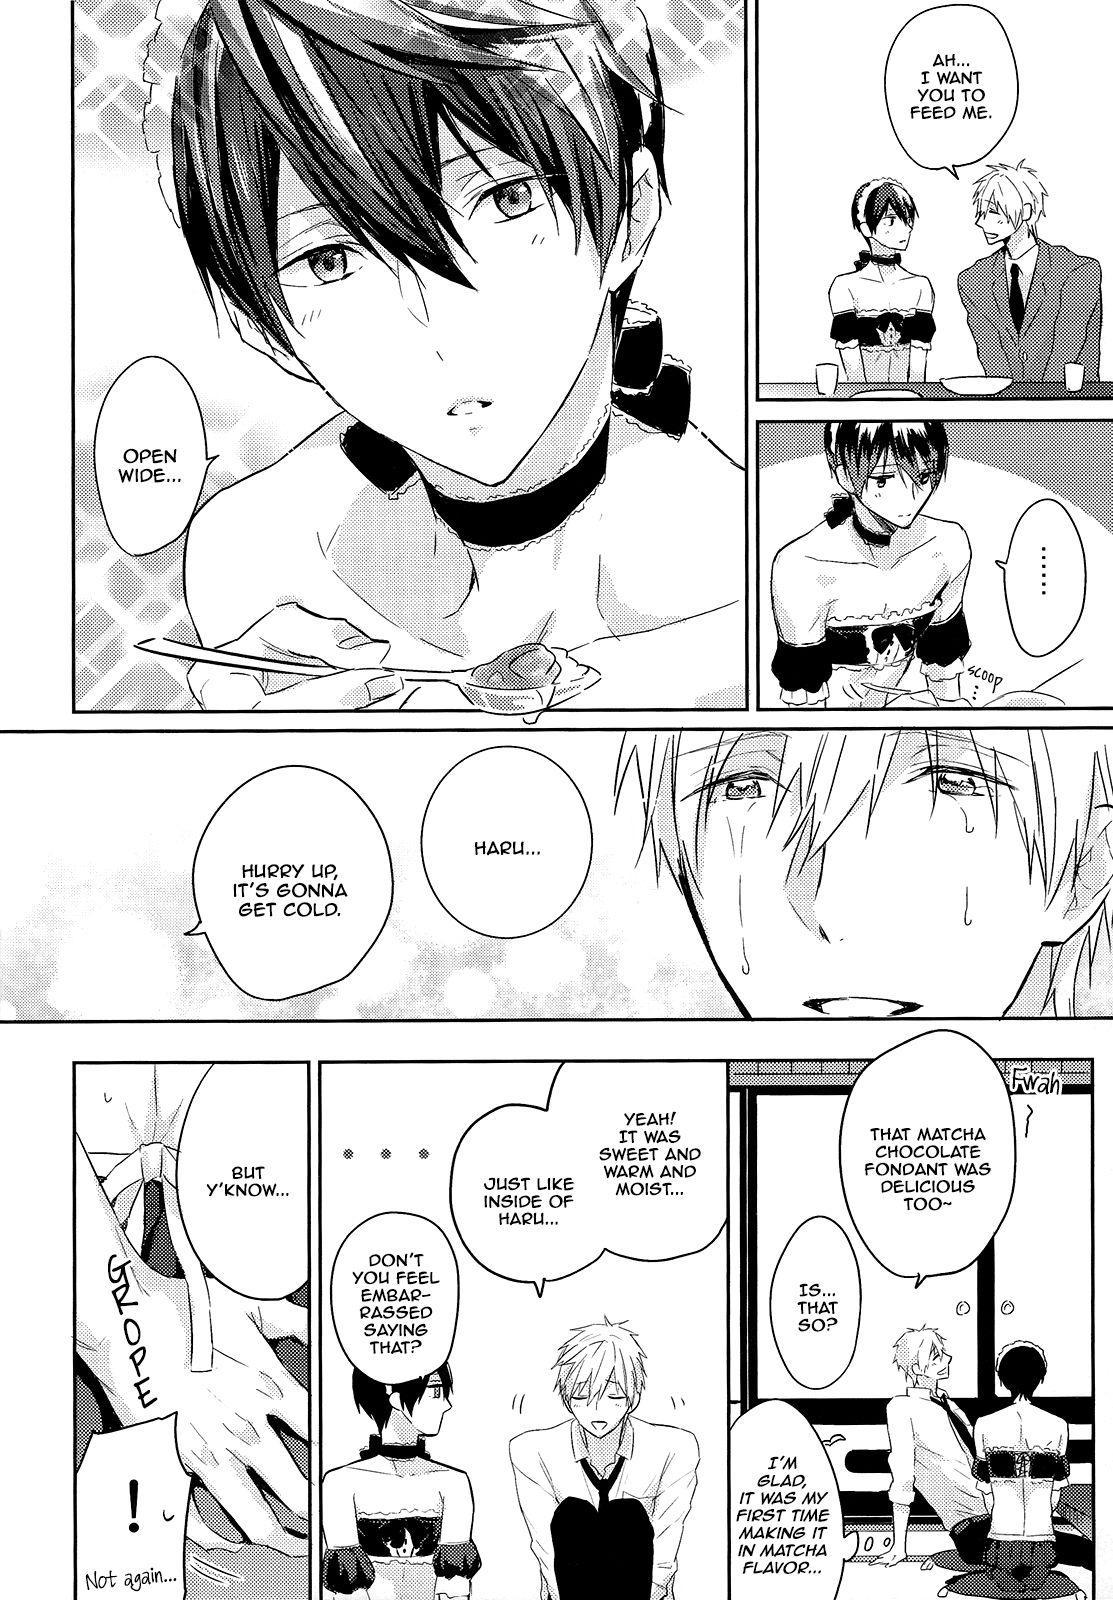 (Renai Endorphin 3) [Sneeeze (Kubu)] Kocchi Muite Maid-san   Over Here, Maid-san (Free!) [English] [mgqr scans] 8